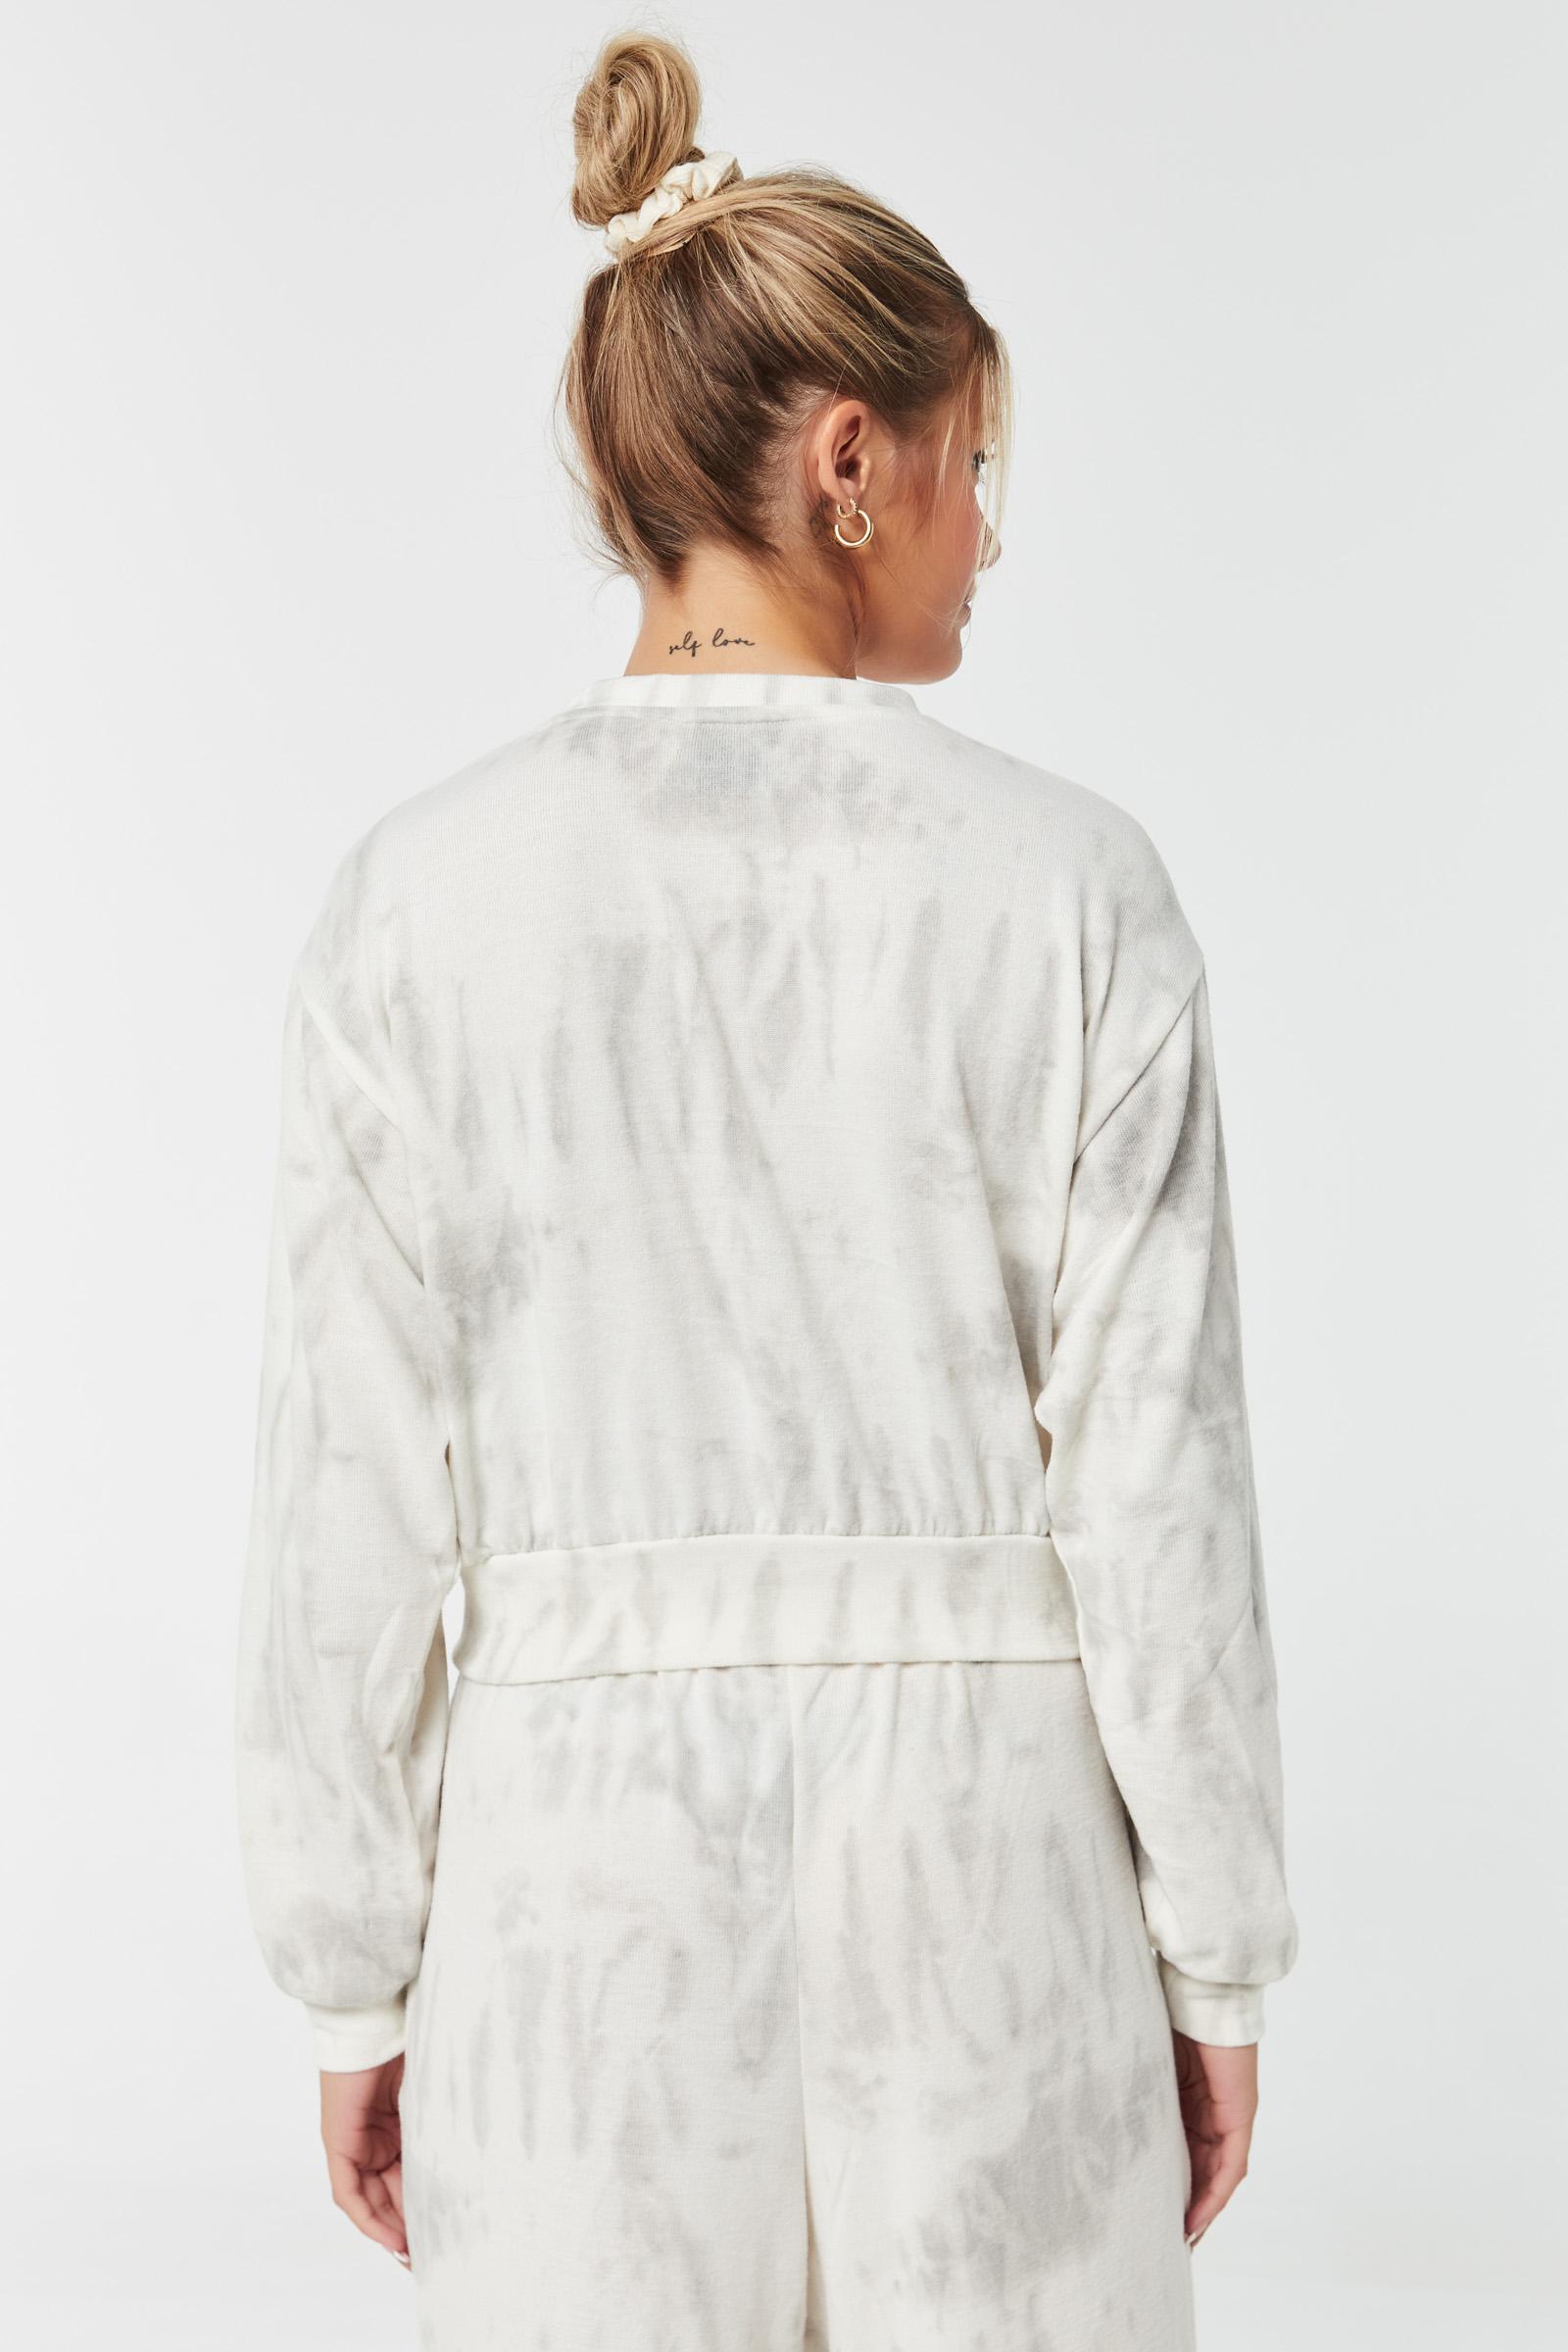 Tie-Dye Brushed Sweatshirt